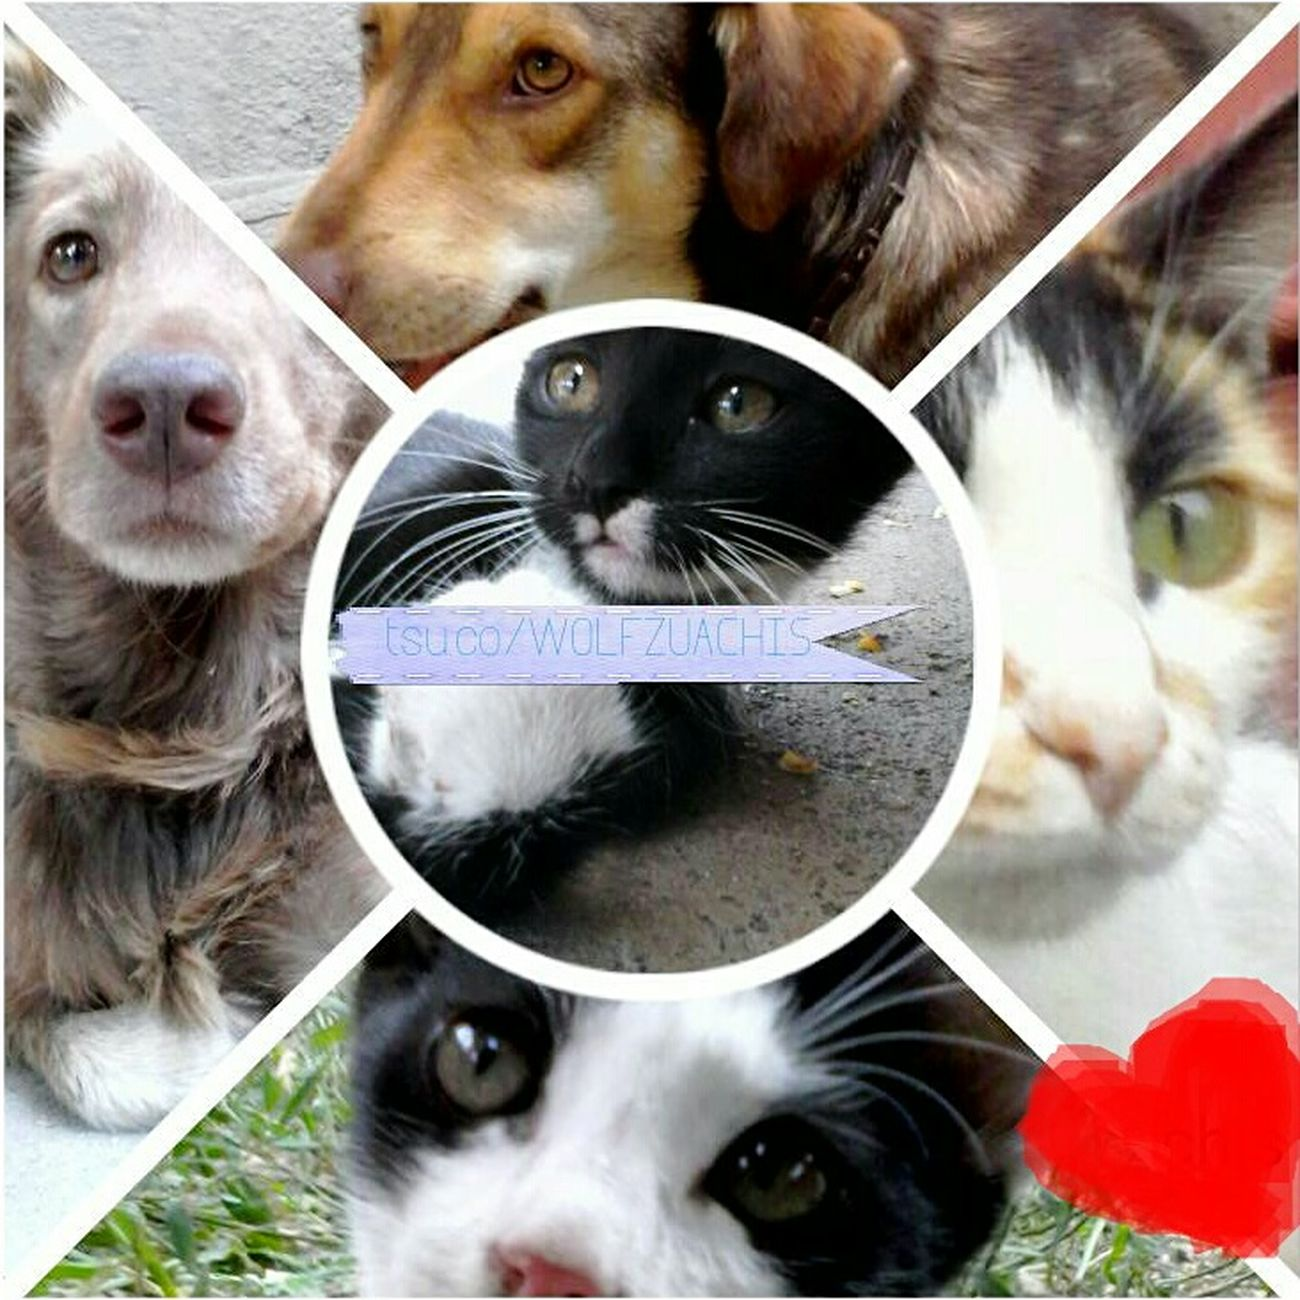 Cute Animals @wolfzuachis Pufosenii Colage Colaj Cats Dogs Wolfzuachis